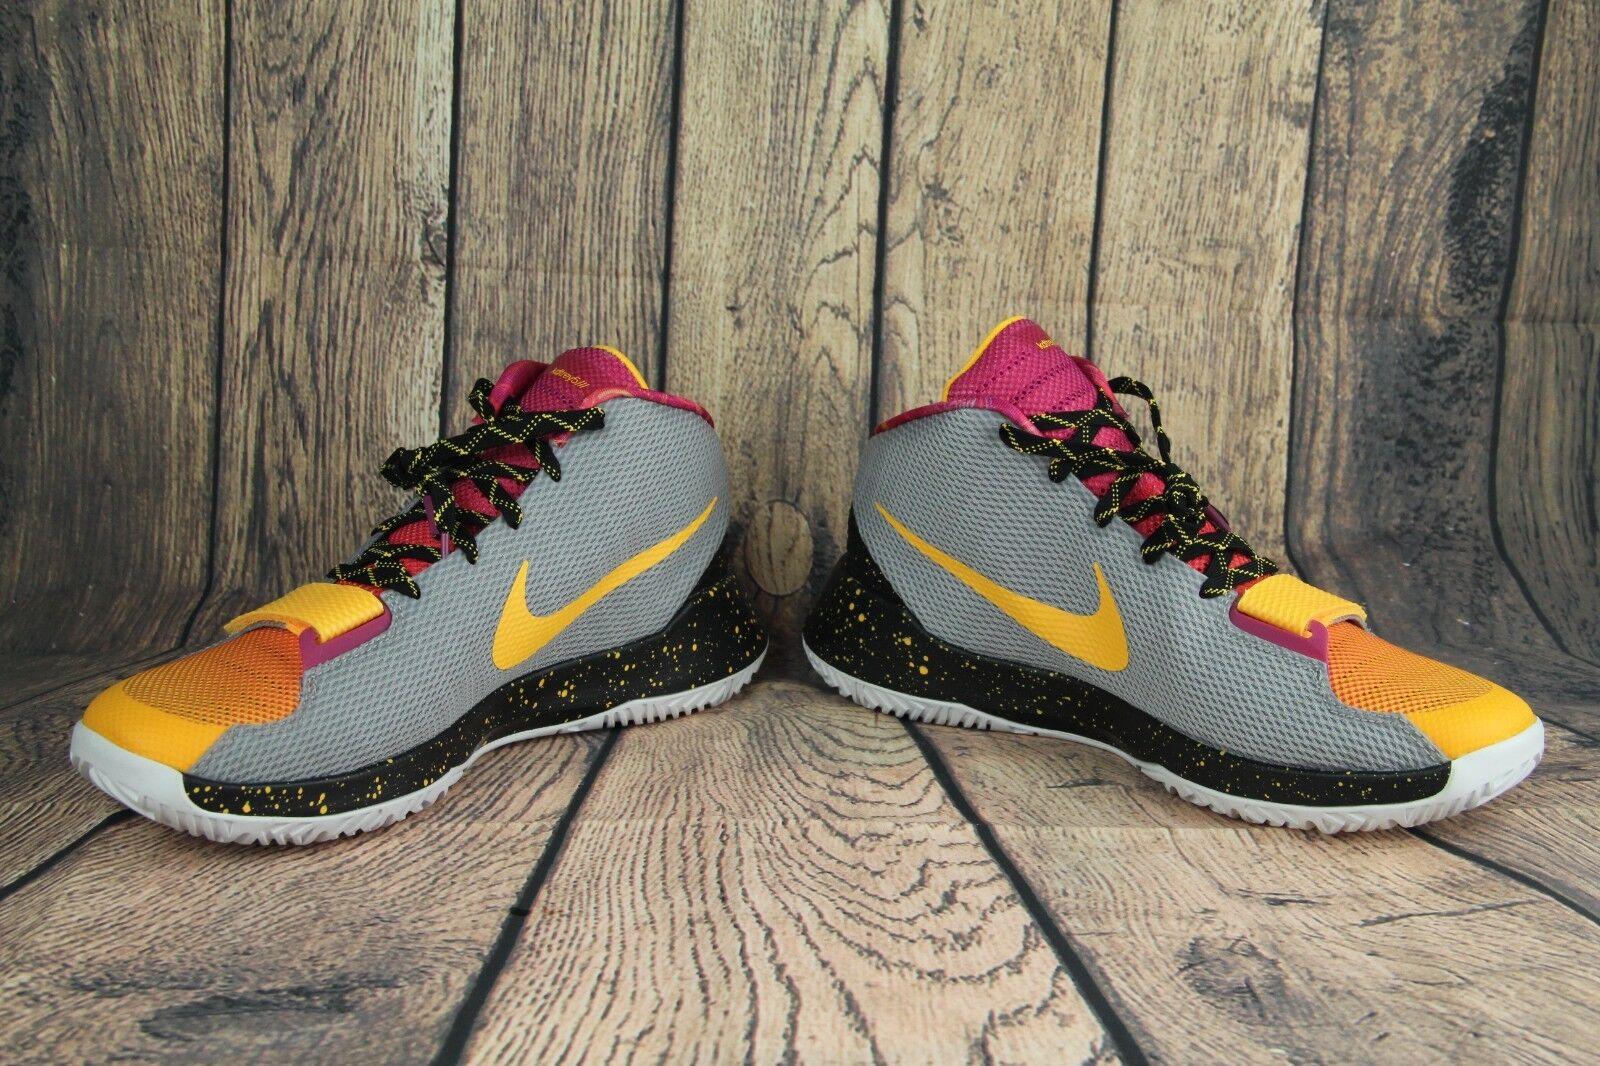 Nike kd trey v 5 iii limitata scarpe Uomo da basket 812558-090 Uomo scarpe sz 11 multi colore 4a4dfa